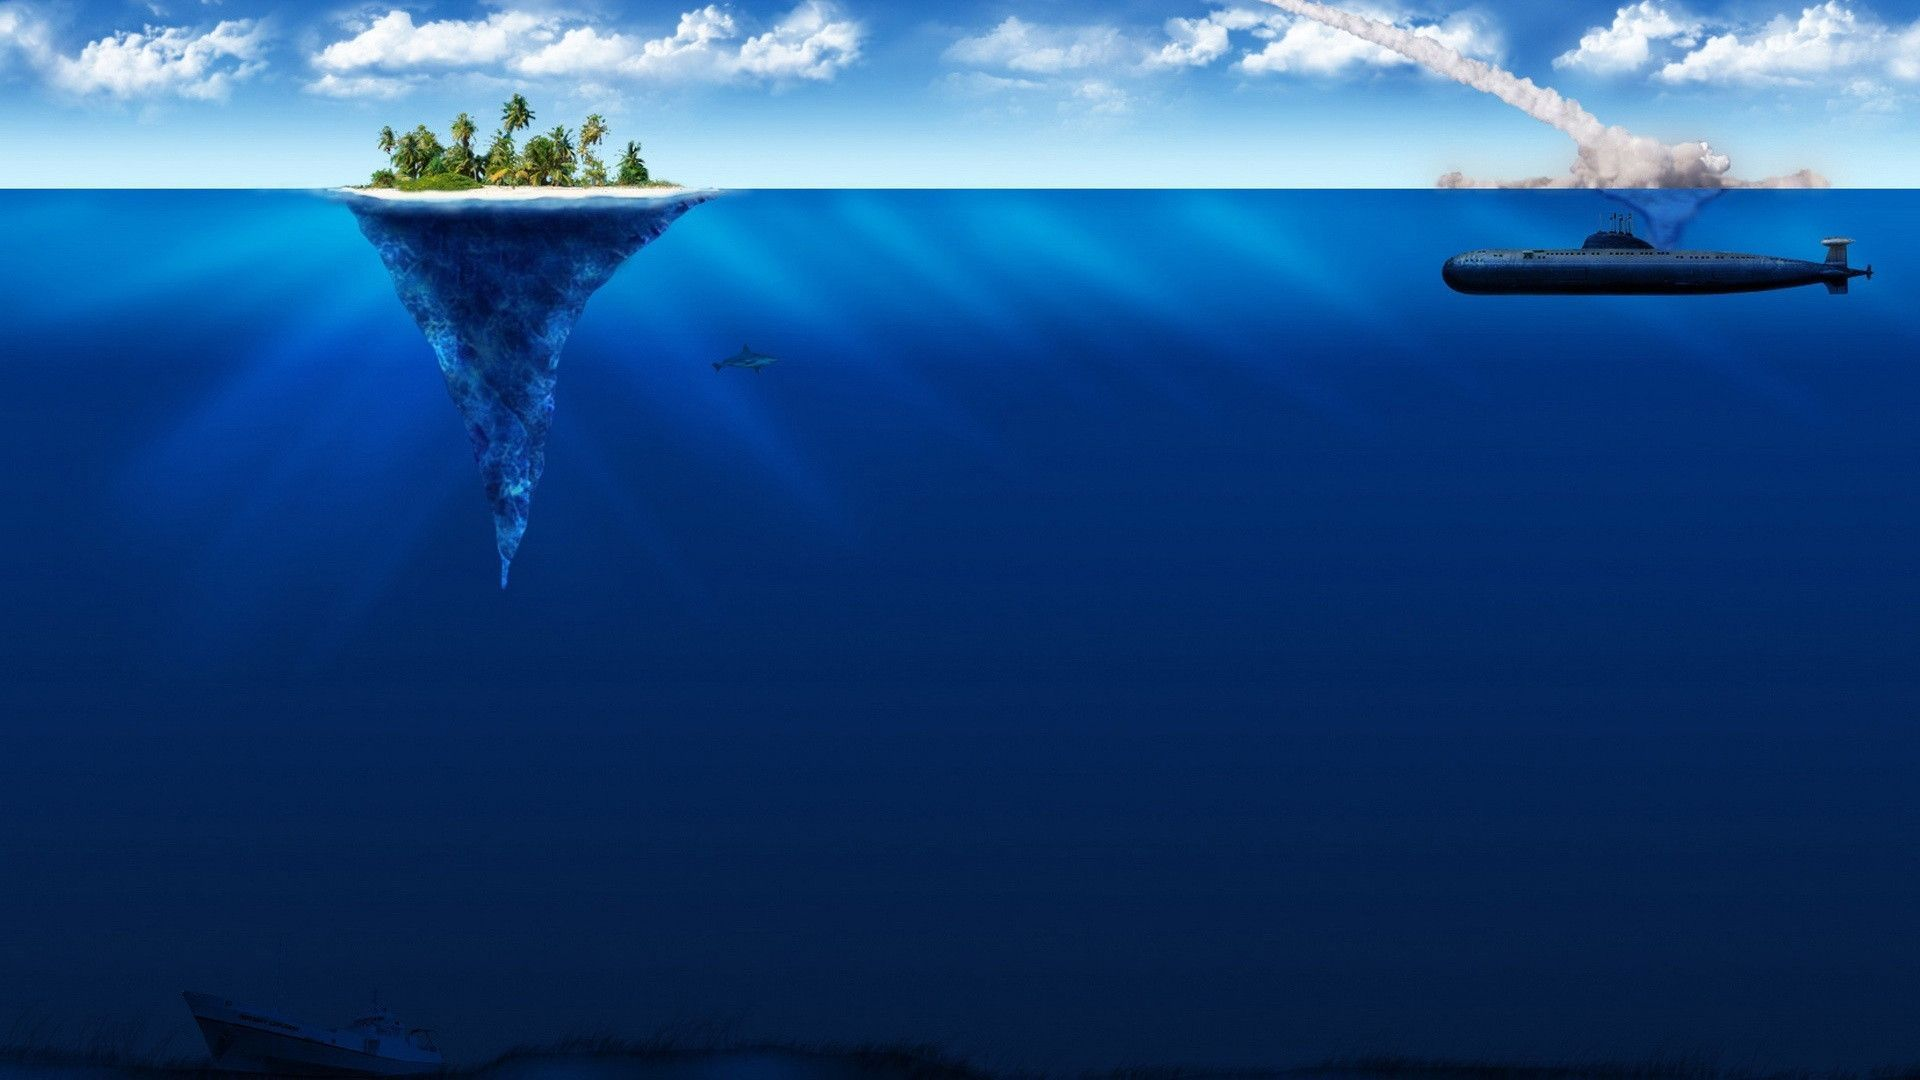 Deep Sea Wallpapers - Wallpaper Cave   Wallpaper   Pinterest   Wallpaper, Underwater wallpaper ...